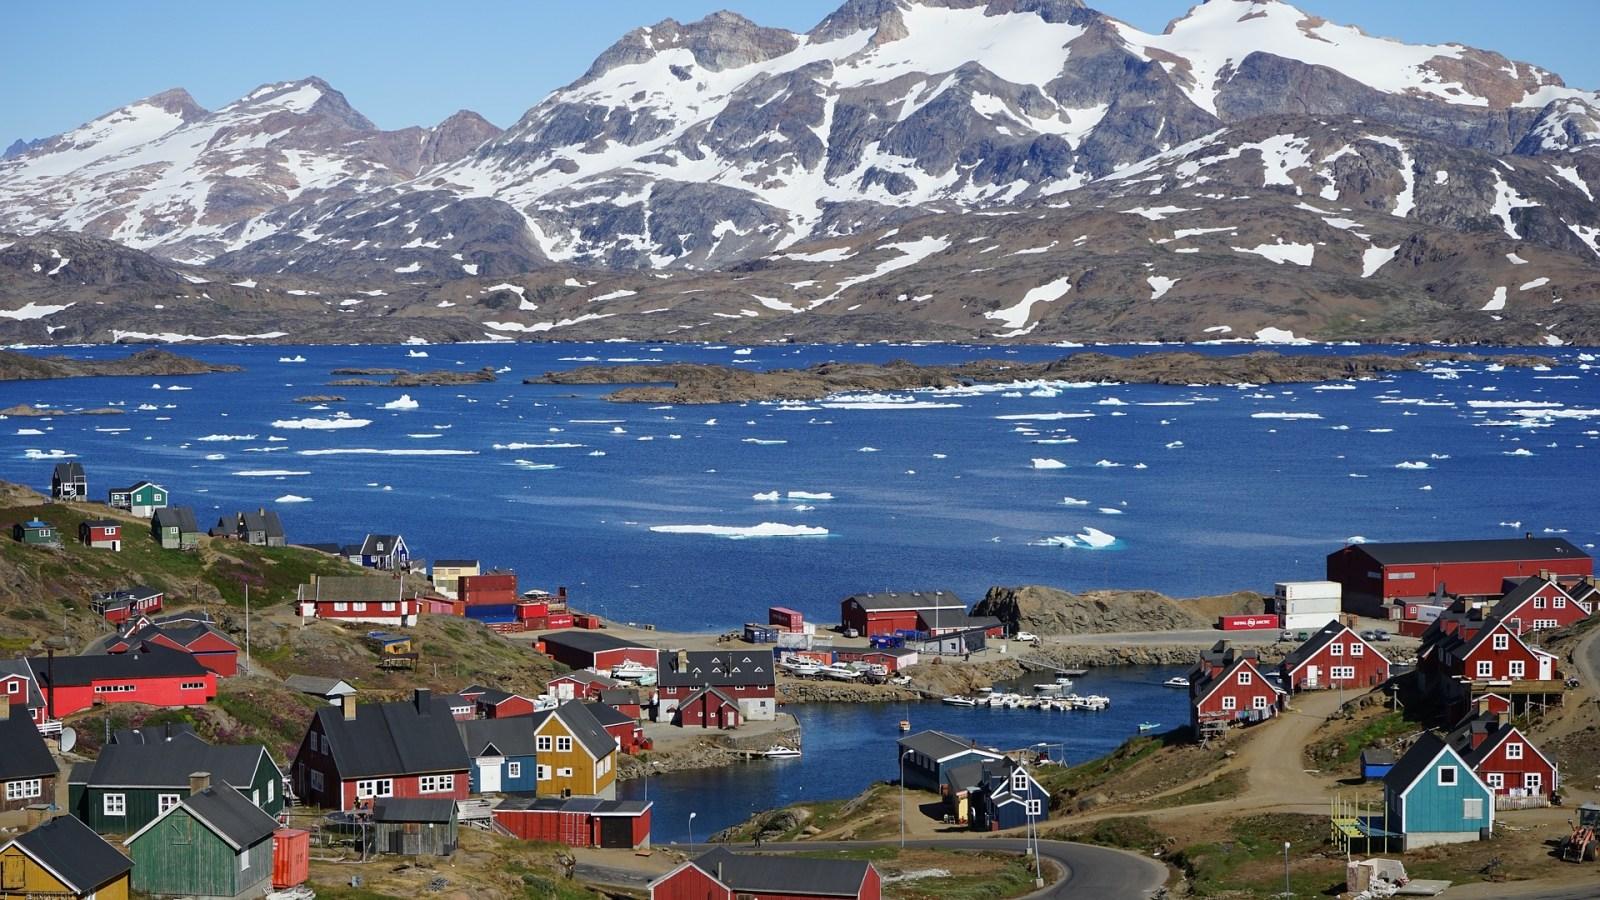 Image of Greenland